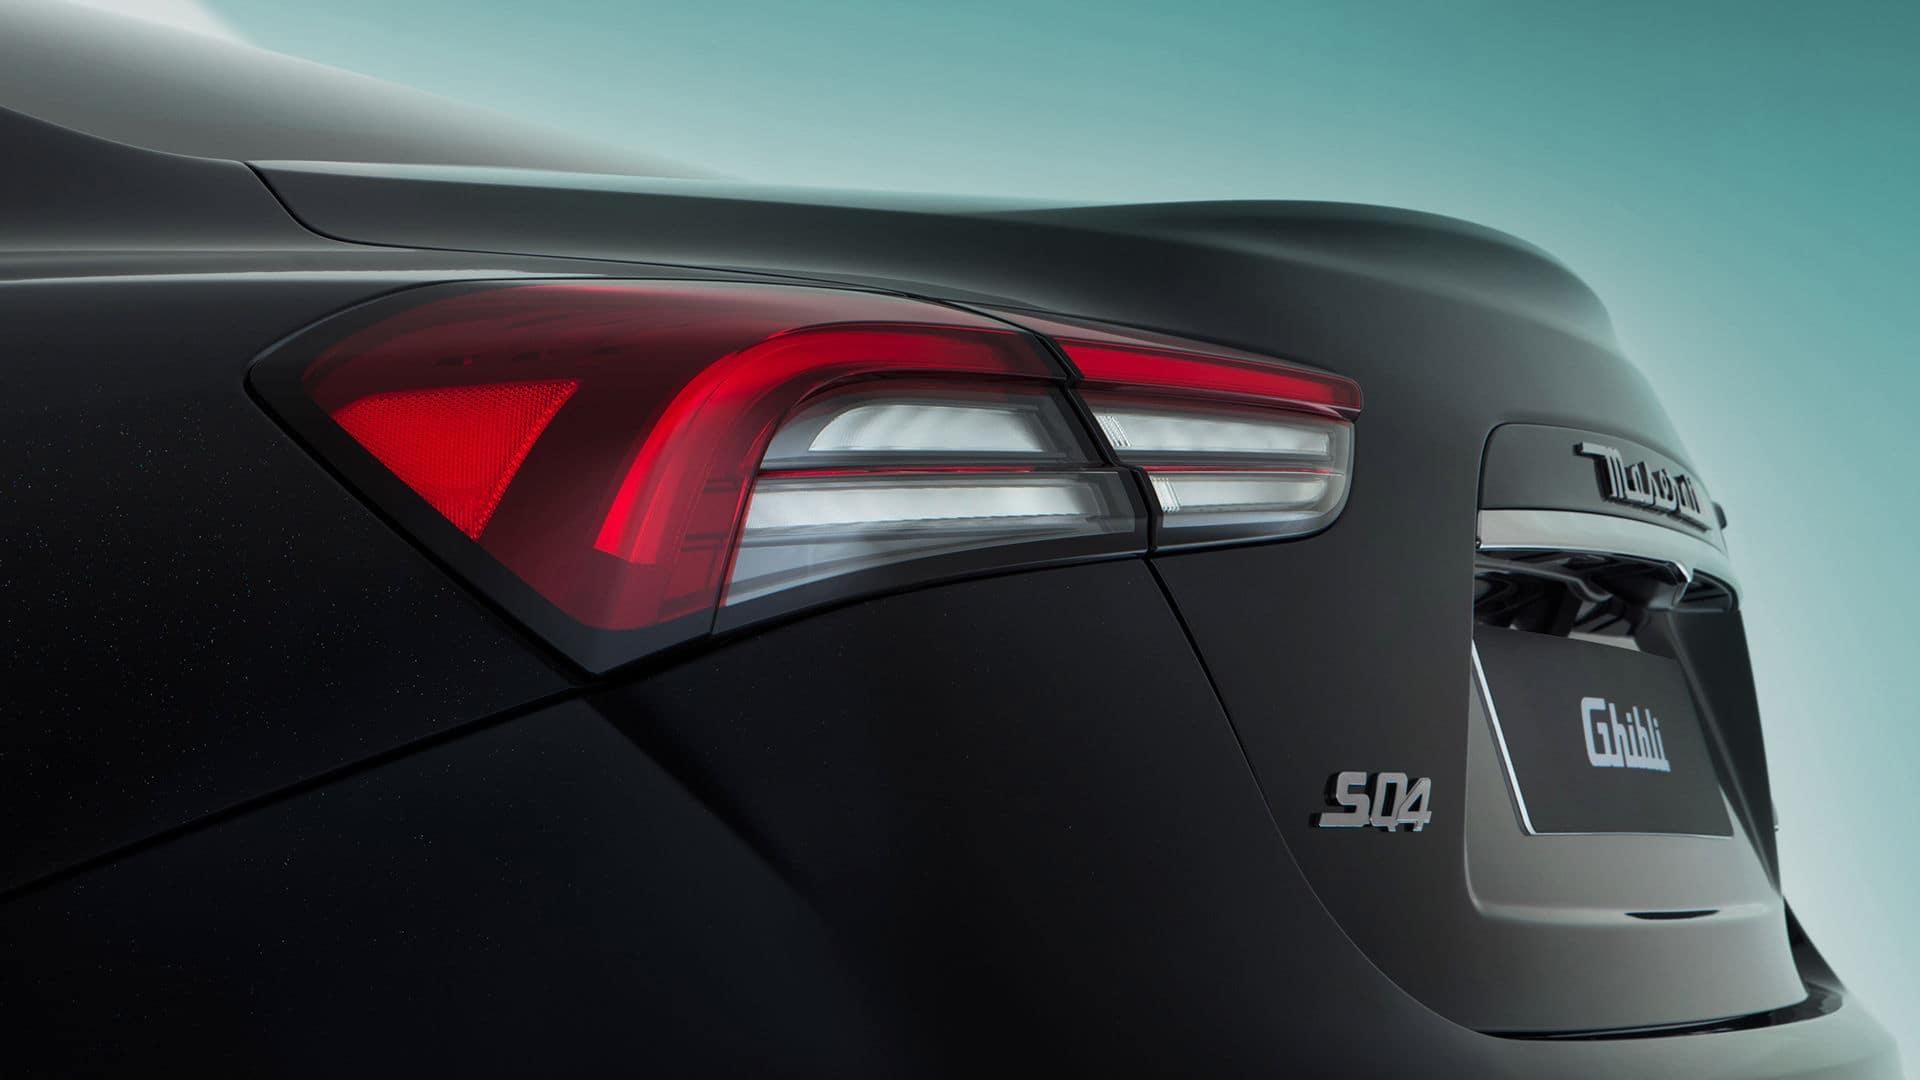 2021 Maserati Ghibli Rear